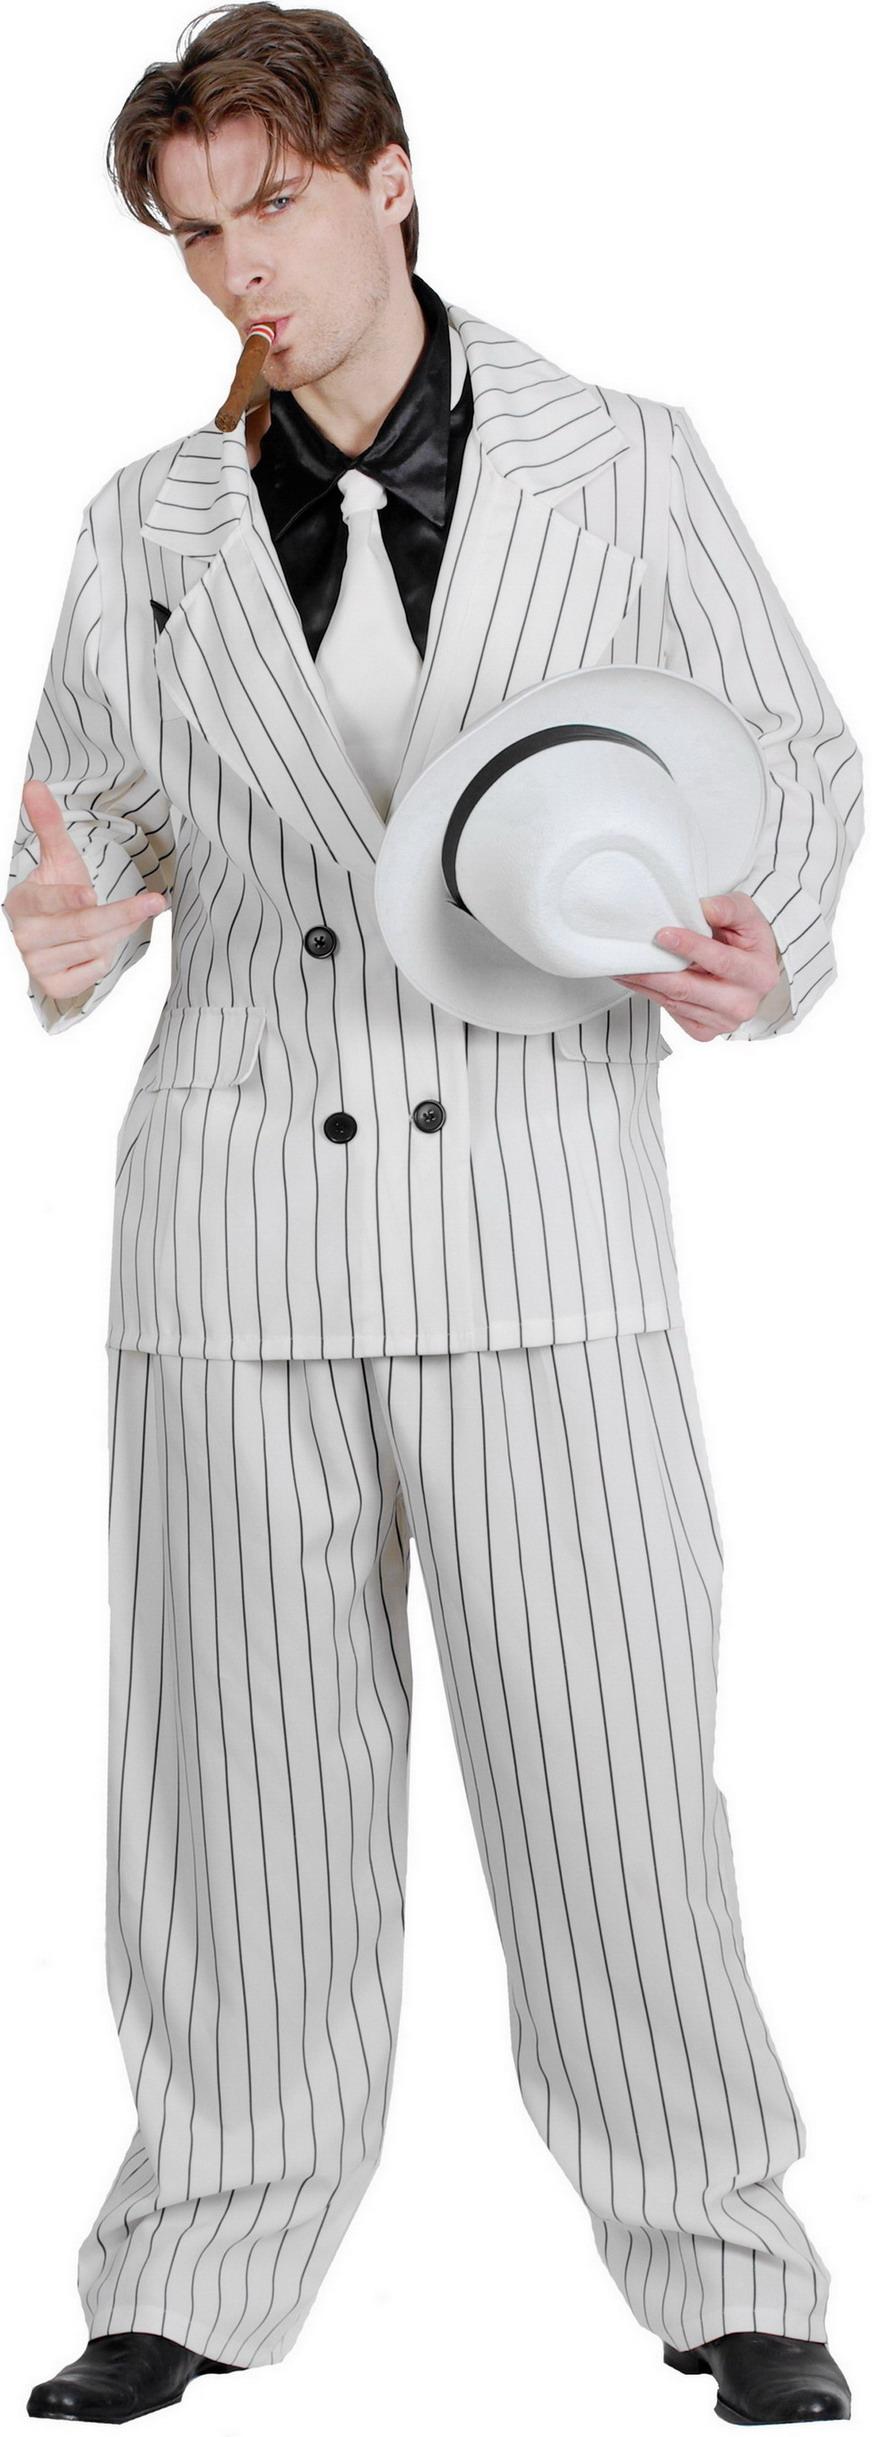 Gangster Suit Fancy Dress Costume - Medium/large - Party Supplies ...